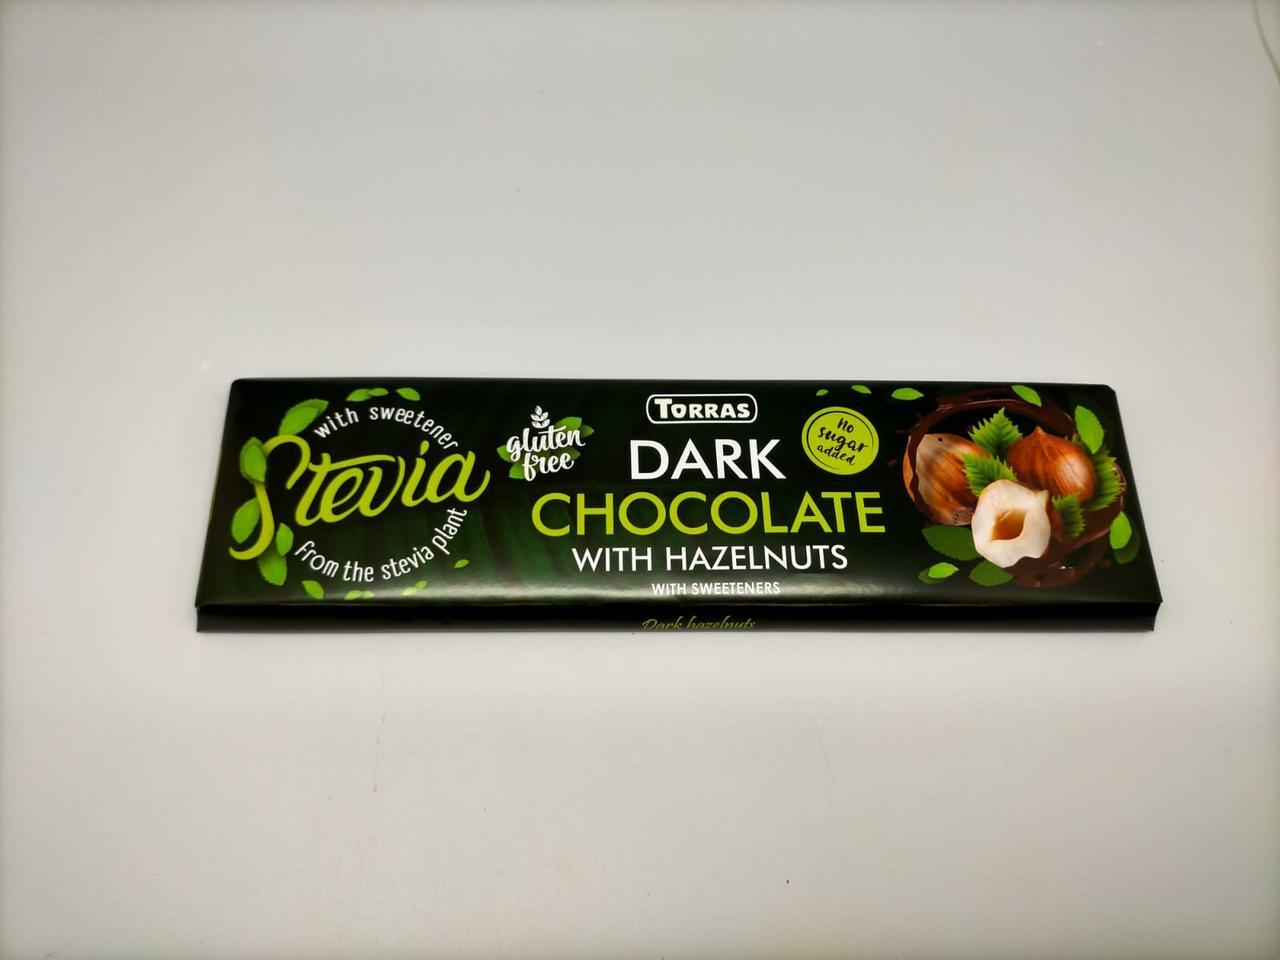 Шоколад темный без сахара и глютена Торрас с фундуком Torras Stevia Dark Huzelnuts 300 г Испания